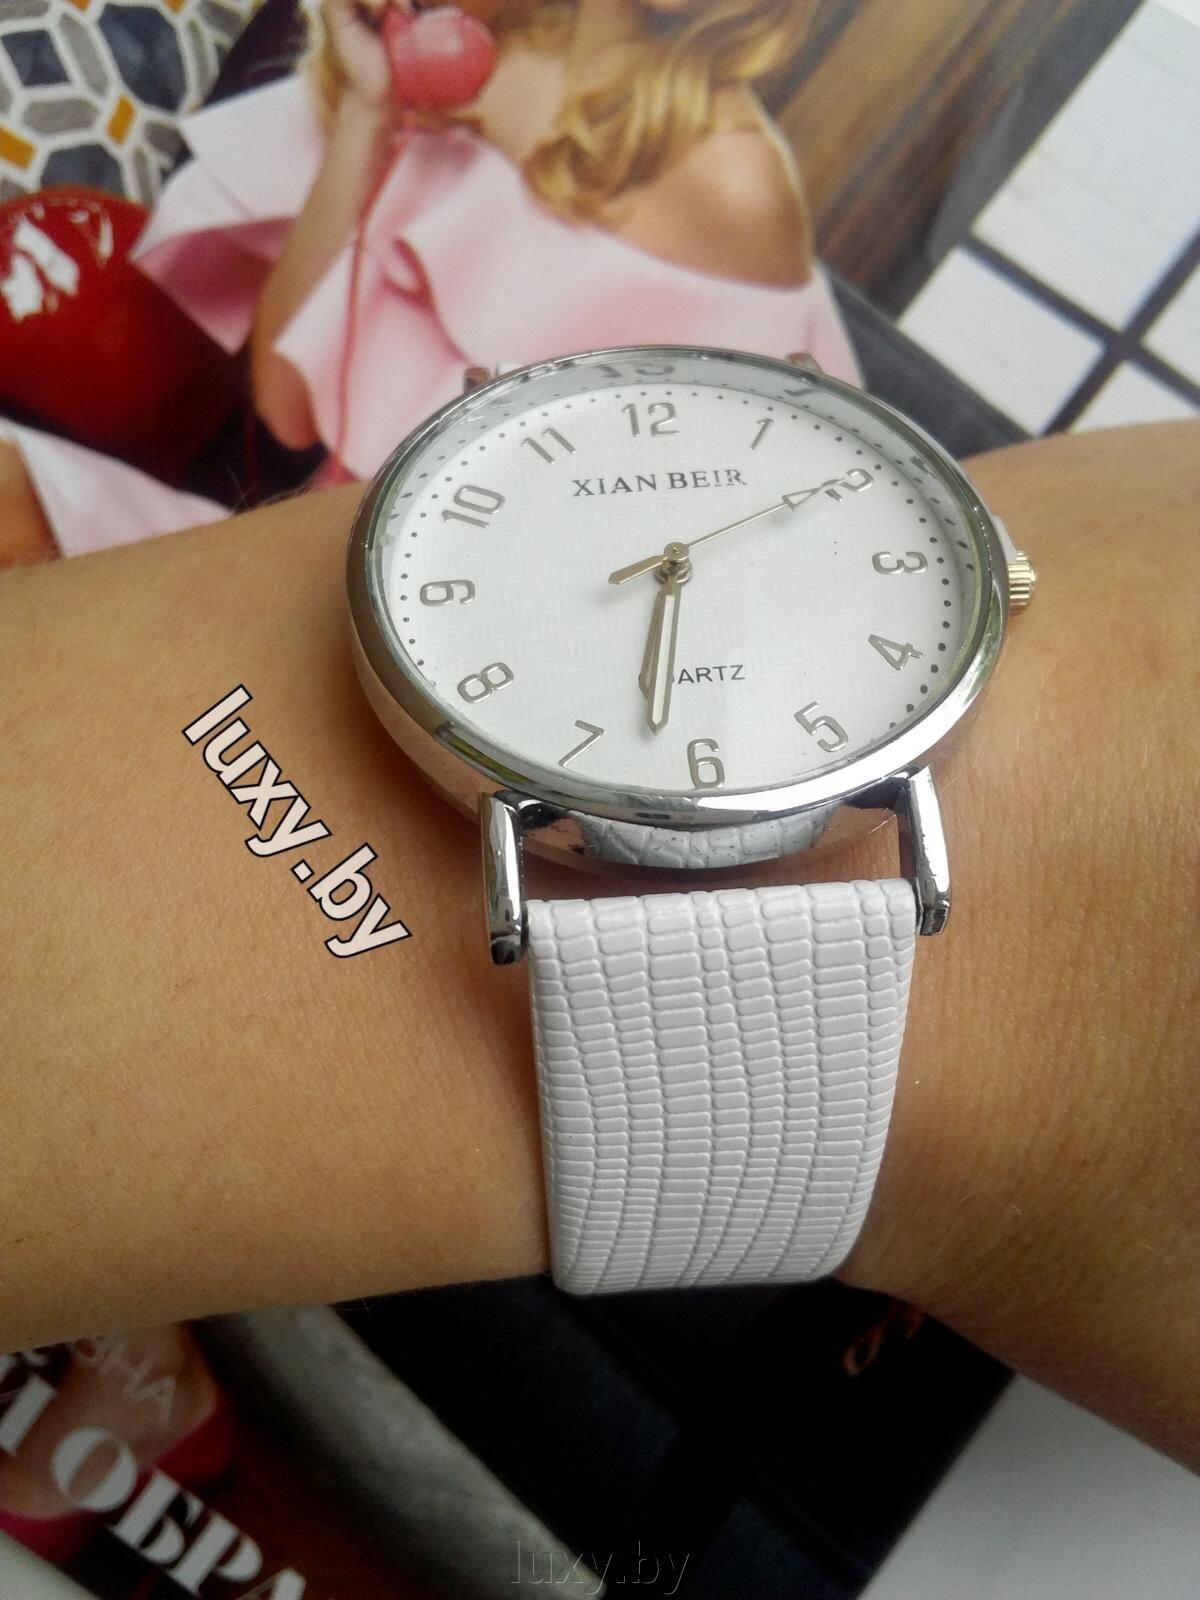 Часы наручные женские белые, прорисованные цифры, арт.Н-5 - фото pic_210a99b010a22ce_1920x9000_1.jpg